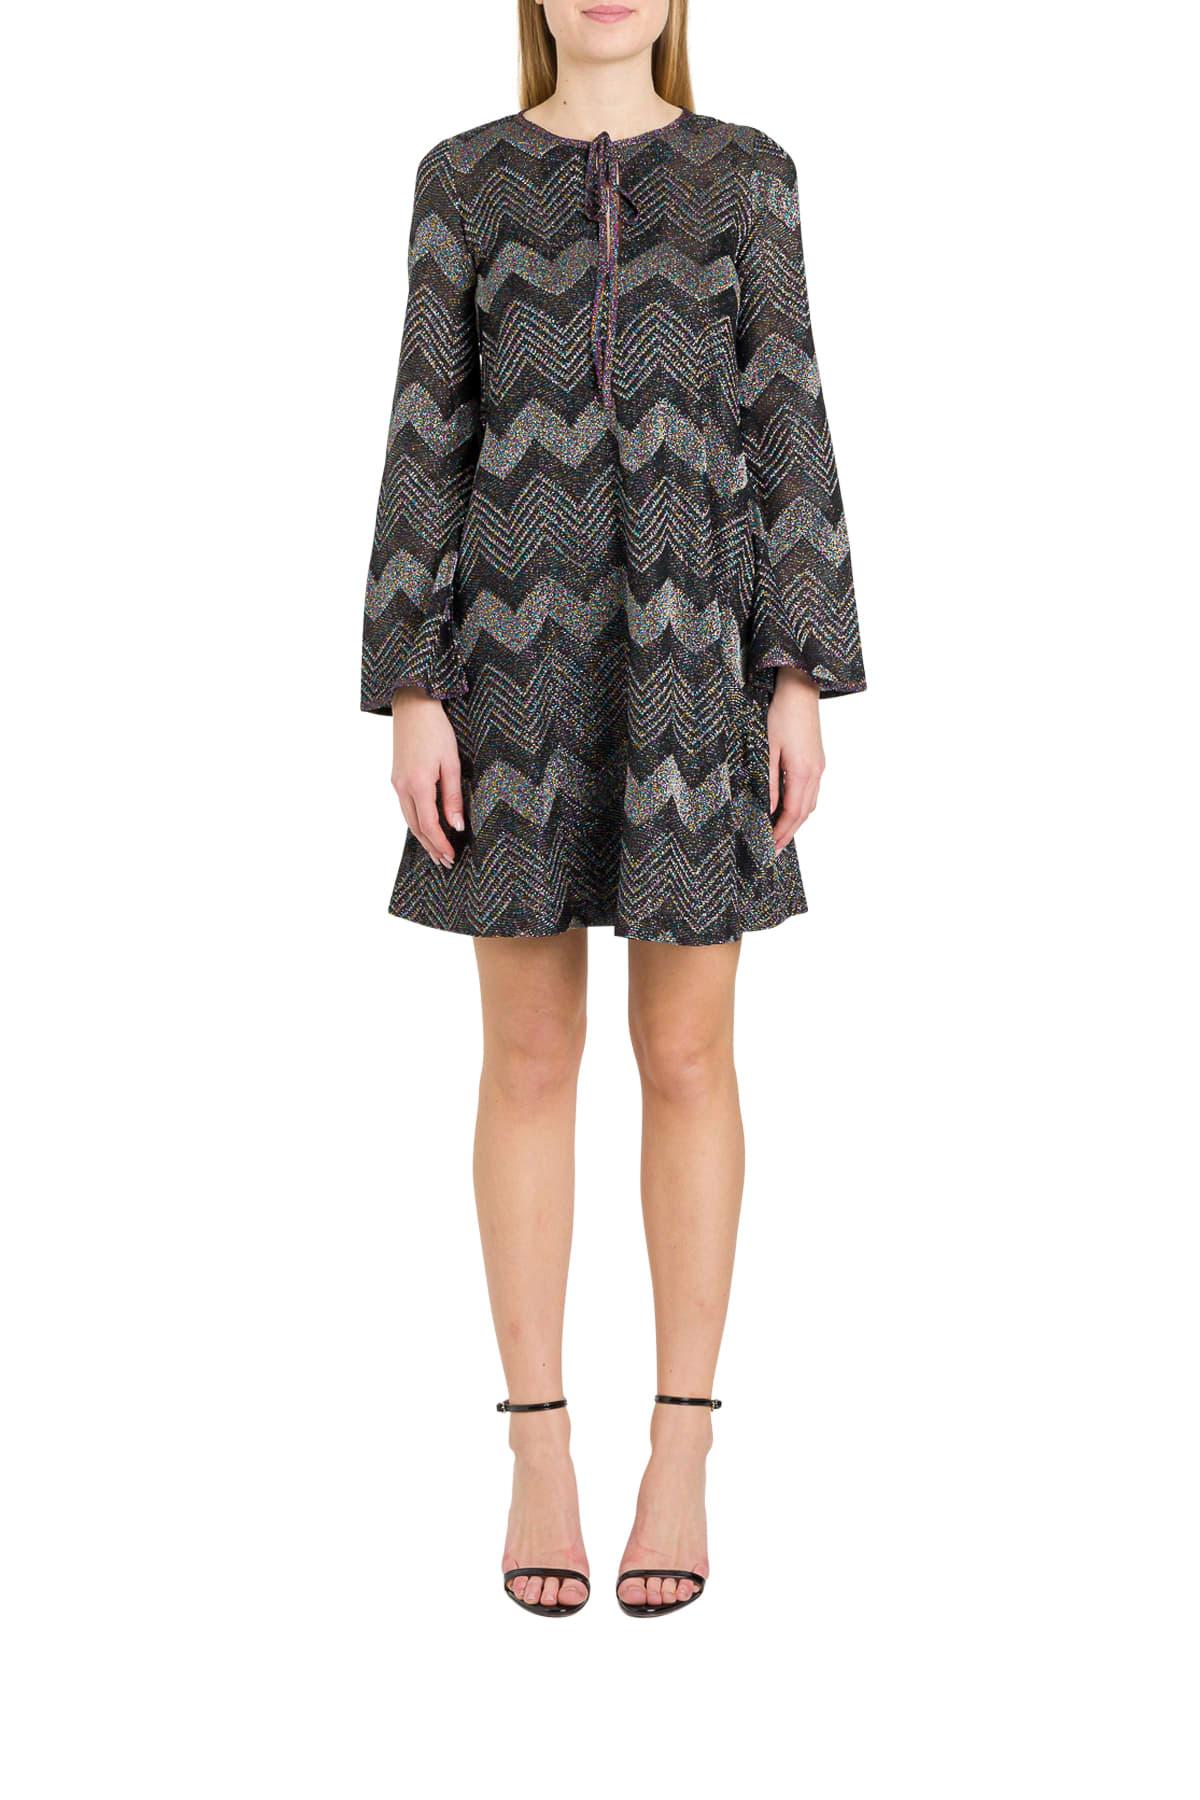 Buy M Missoni Herringbone Lurex A-line Dress online, shop M Missoni with free shipping